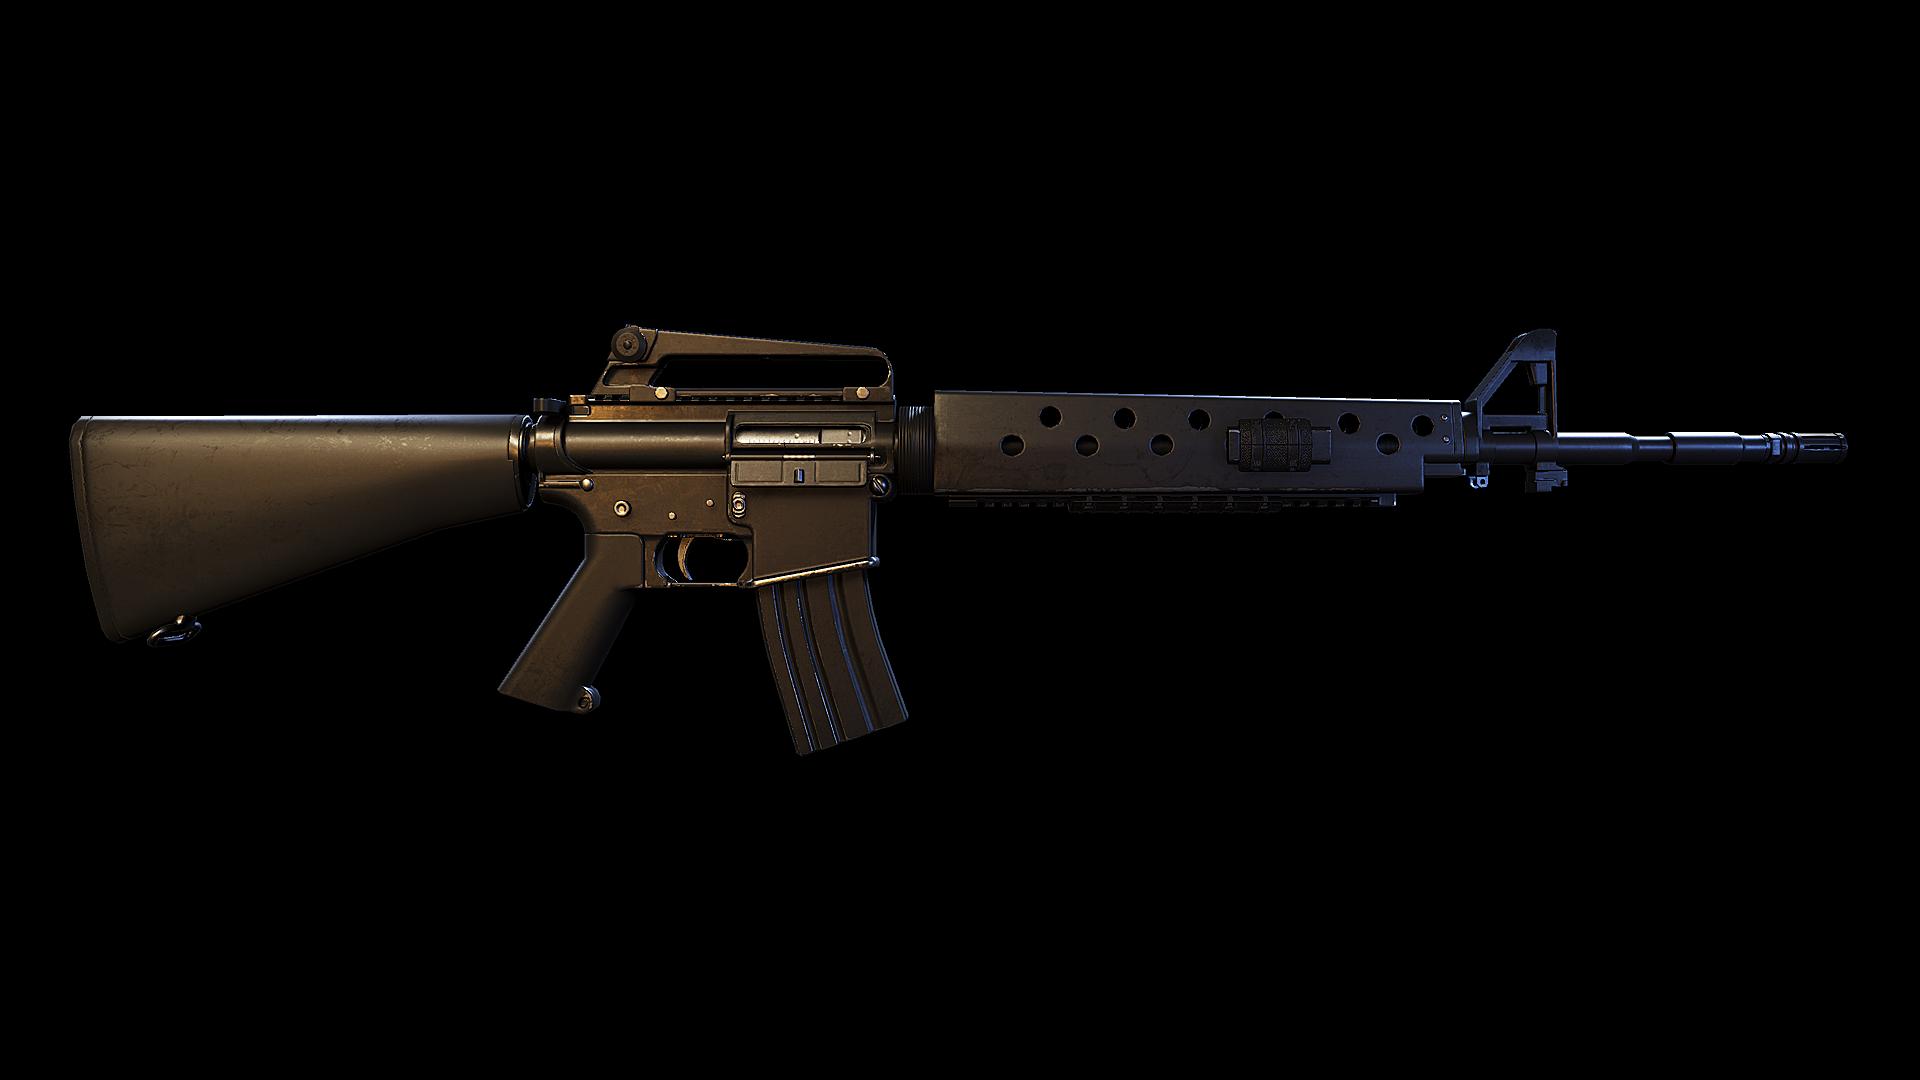 M16/Ghost Recon Wildlands